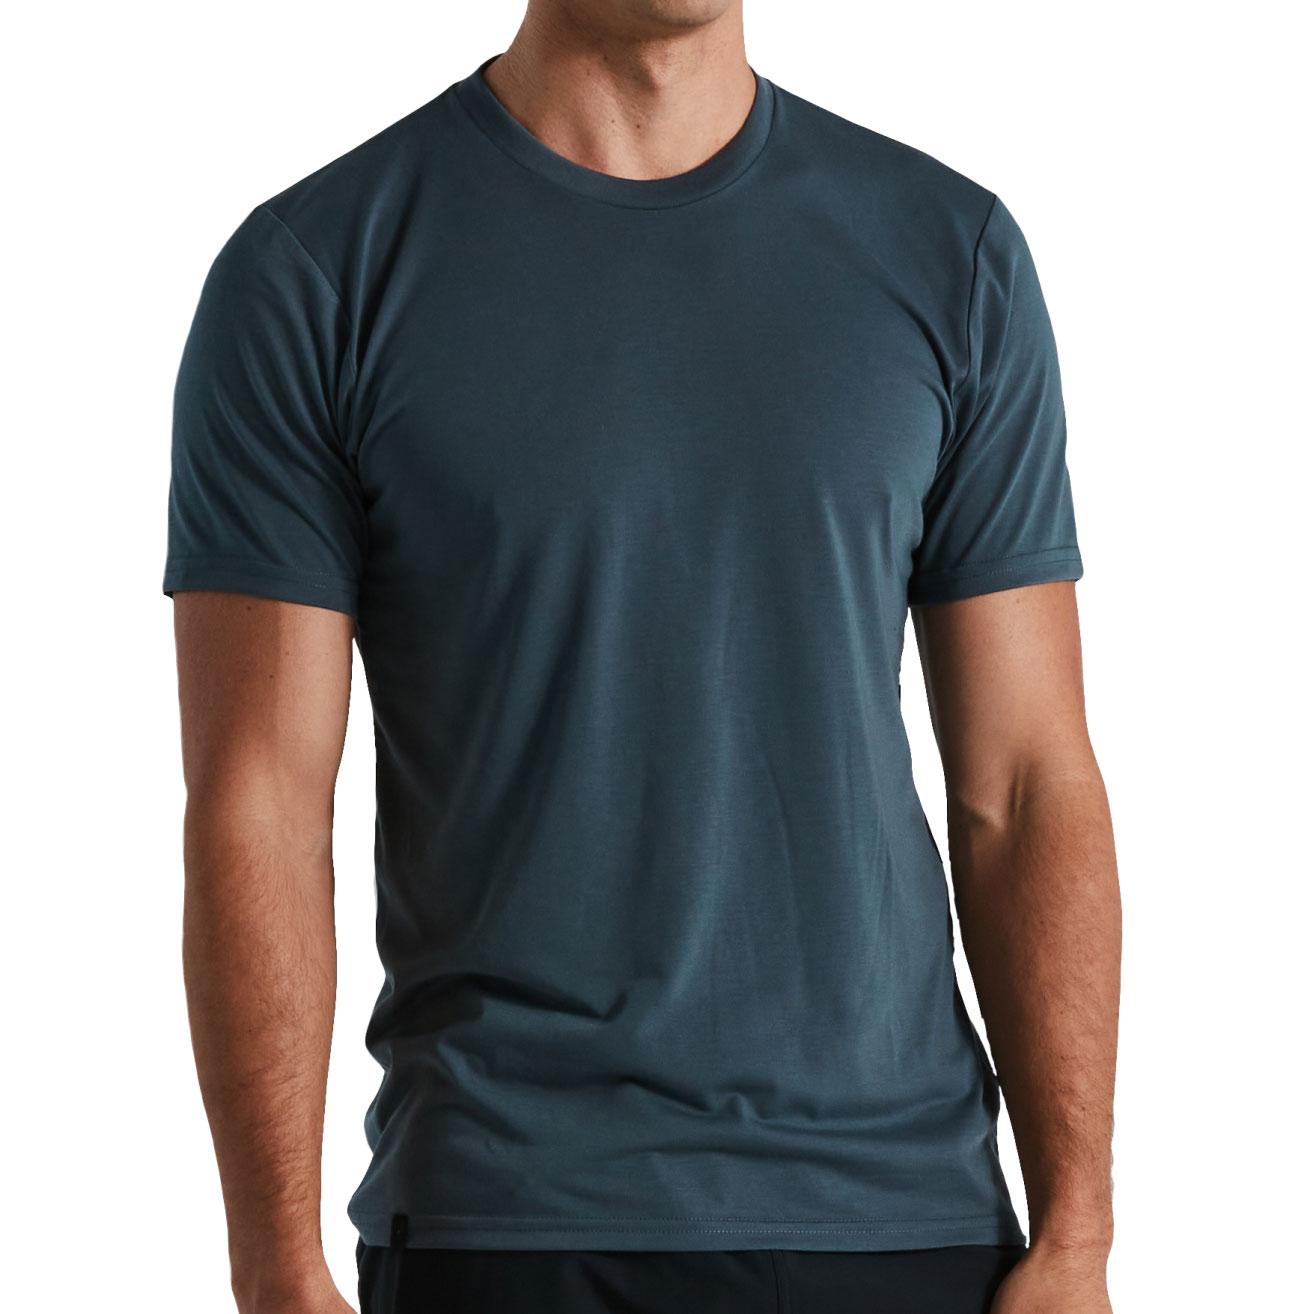 Foto de Specialized Apparel drirelease Tech Camiseta para hombre - cast battleship